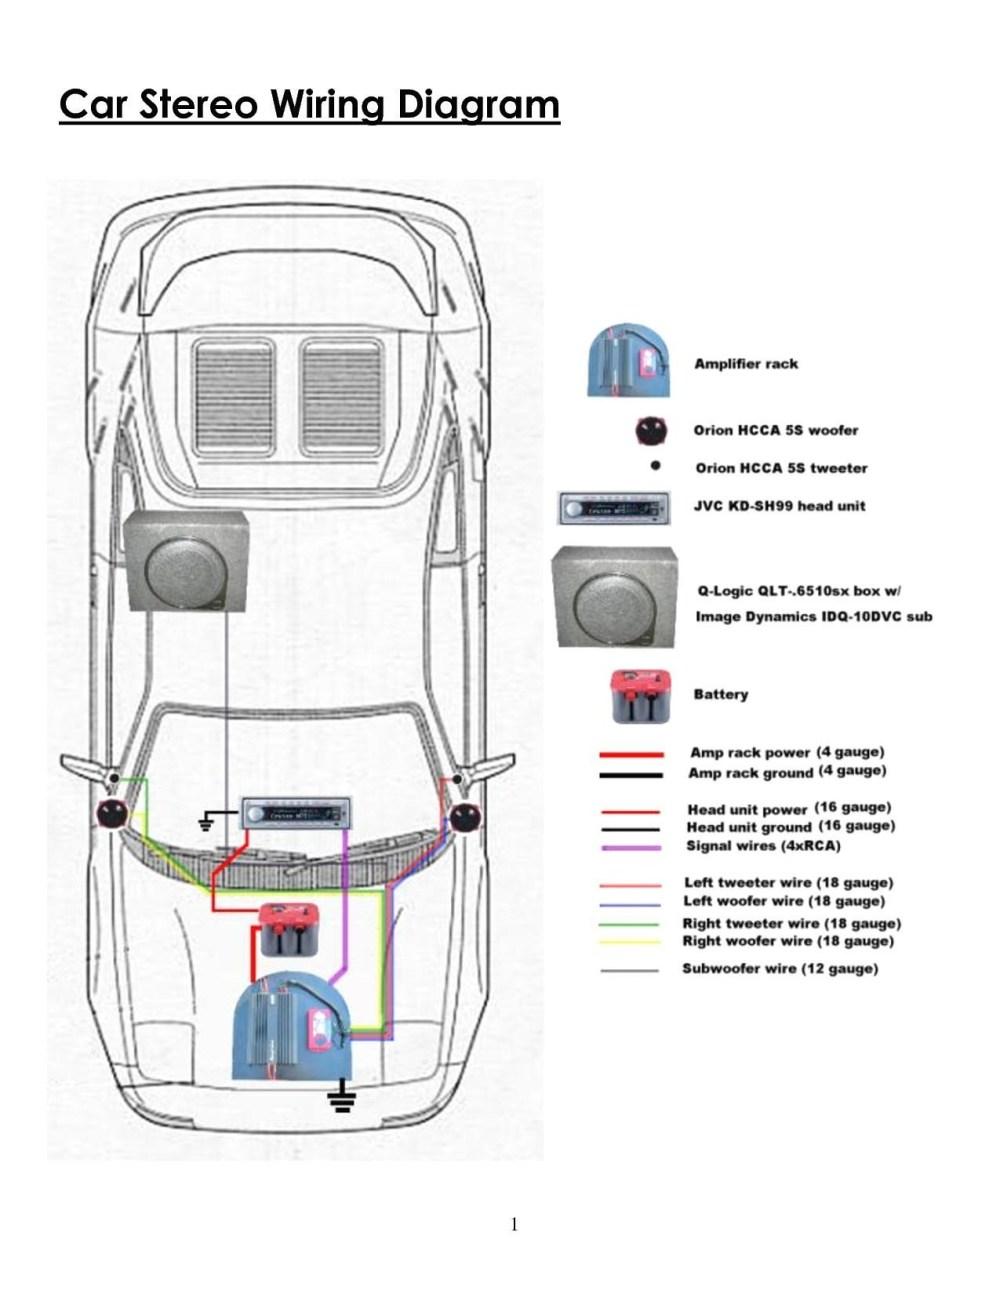 medium resolution of diagram of car gears car subwoofer wiring diagram dual battery wiring data of diagram of car